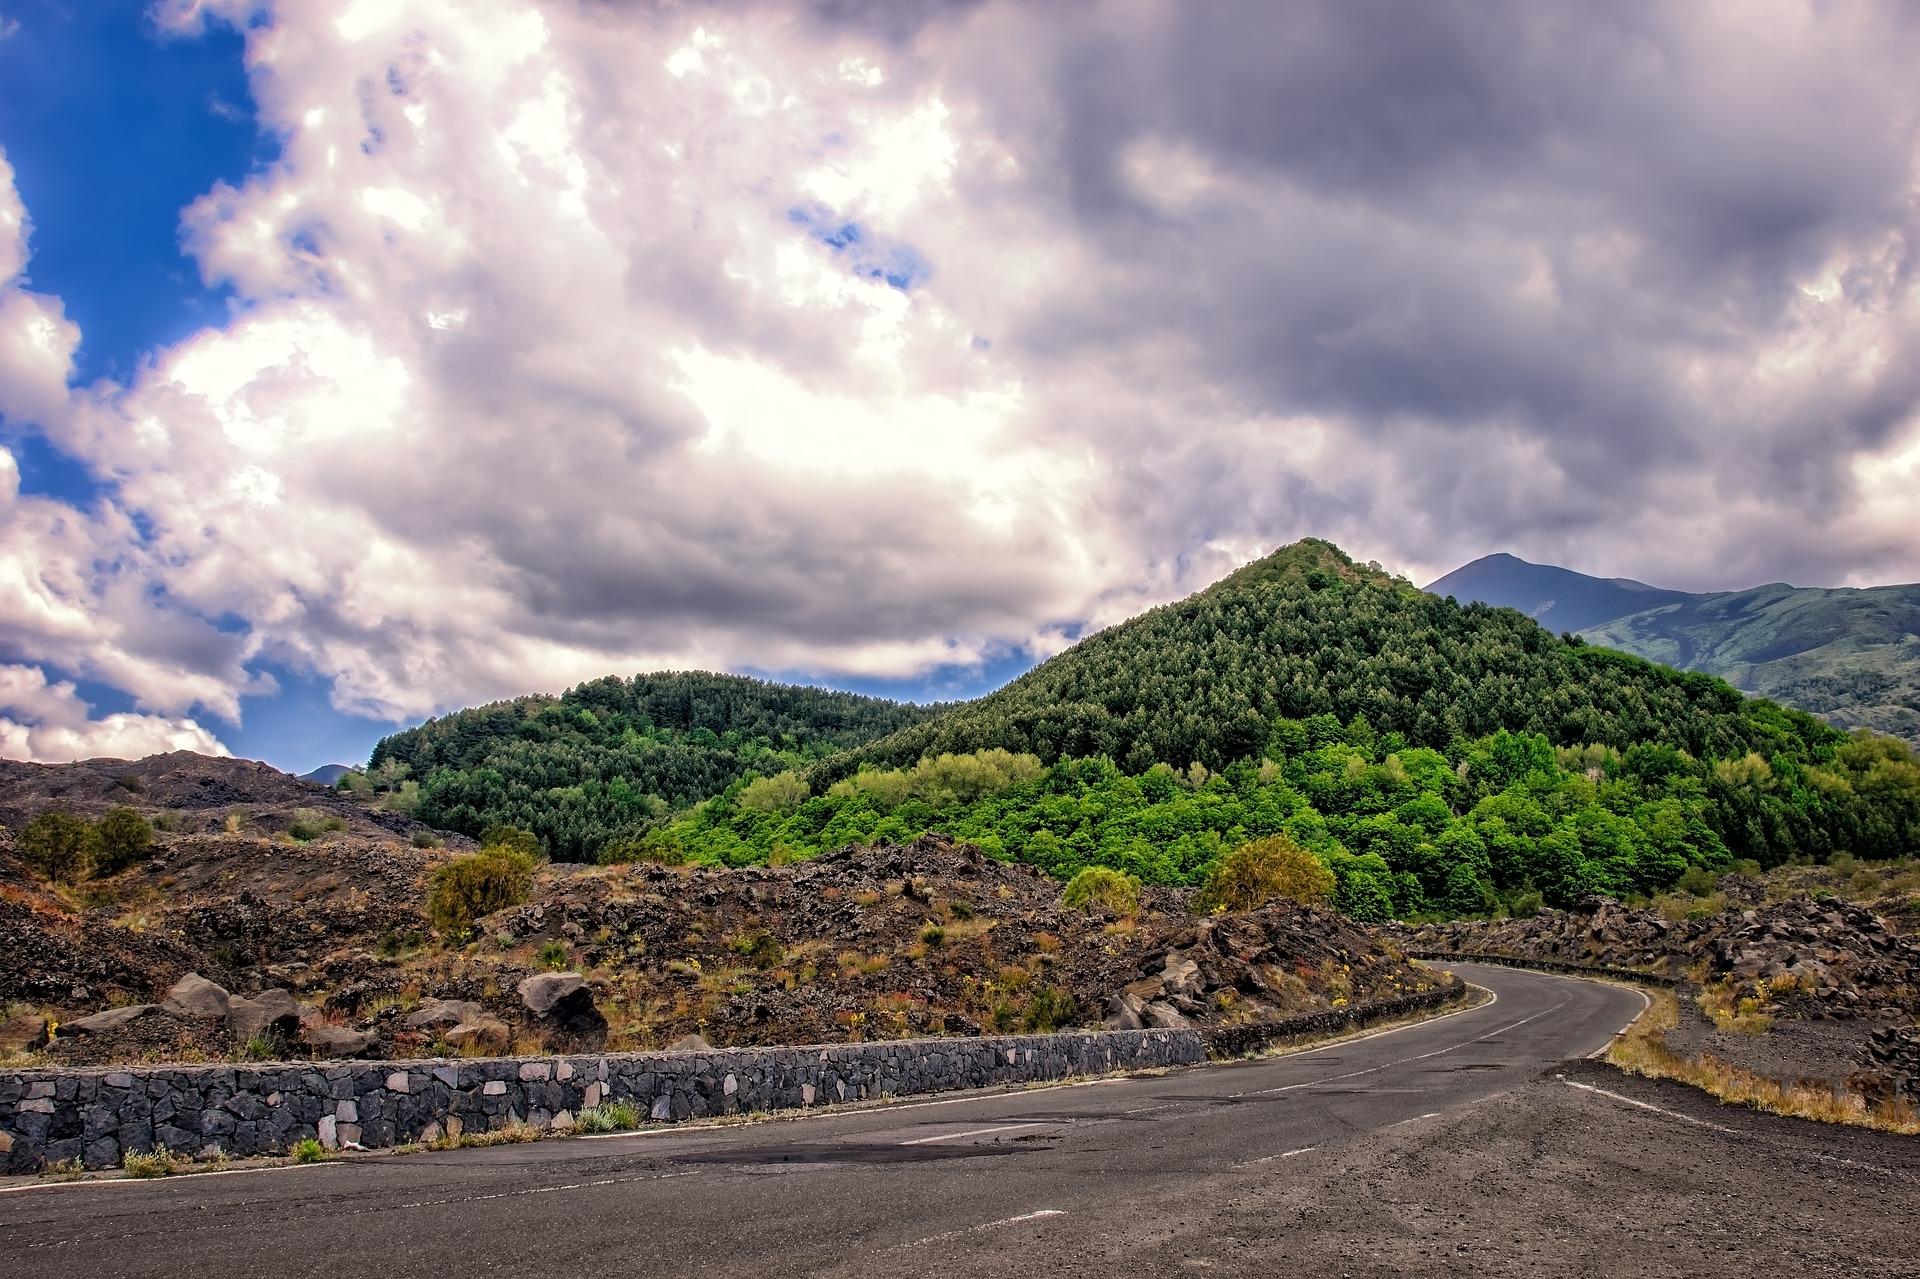 Mount Etna road. Photo via Pixabay.